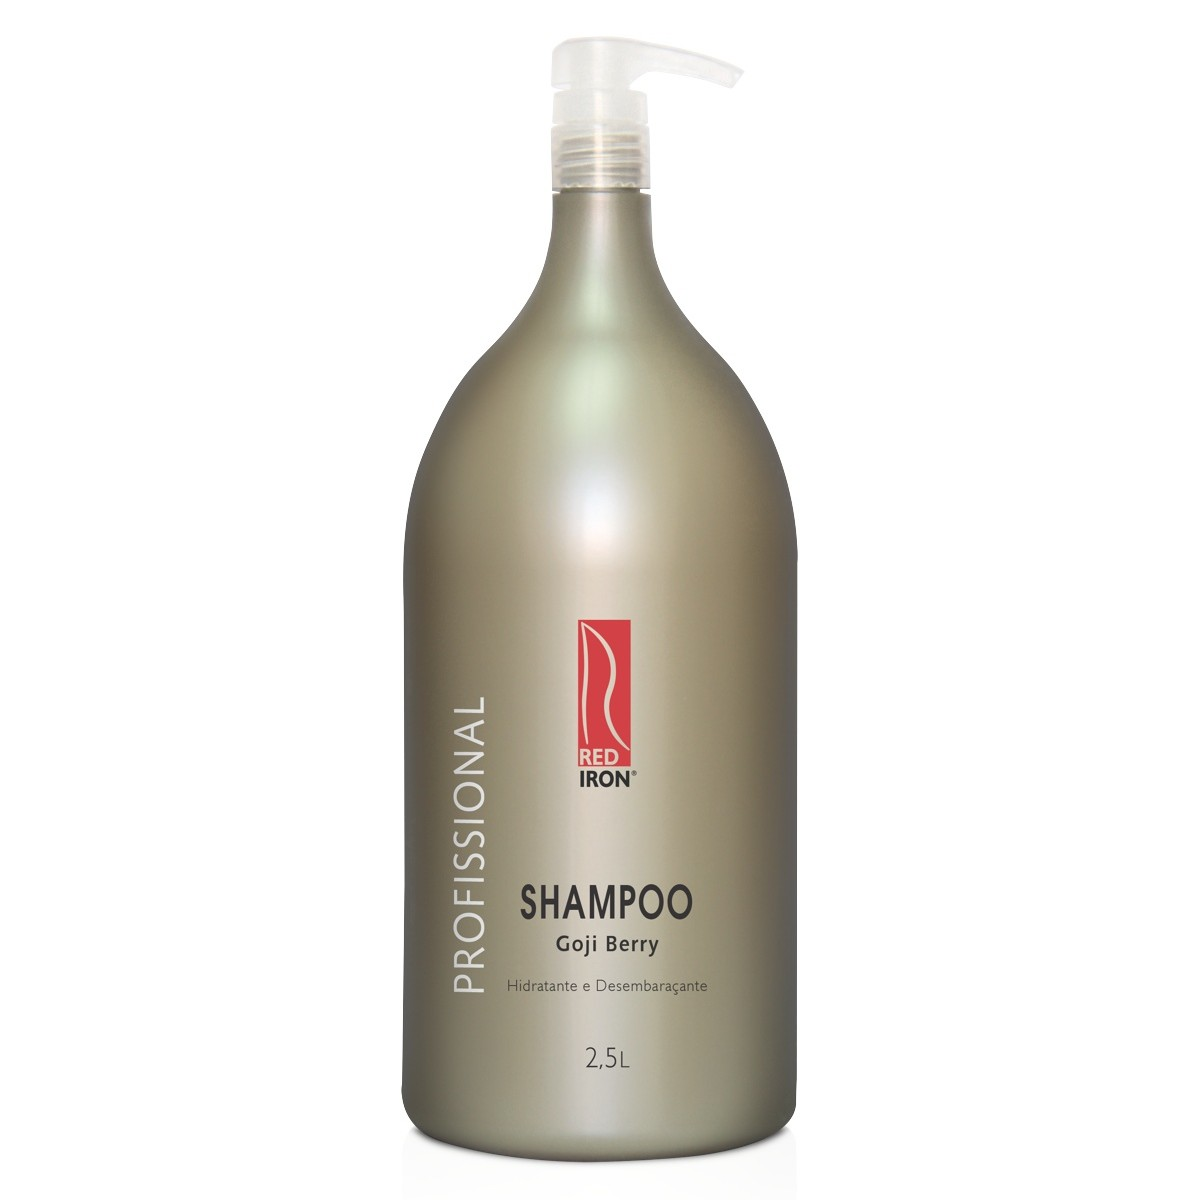 Red Iron Shampoo Goji Berry Profissional 2,5L